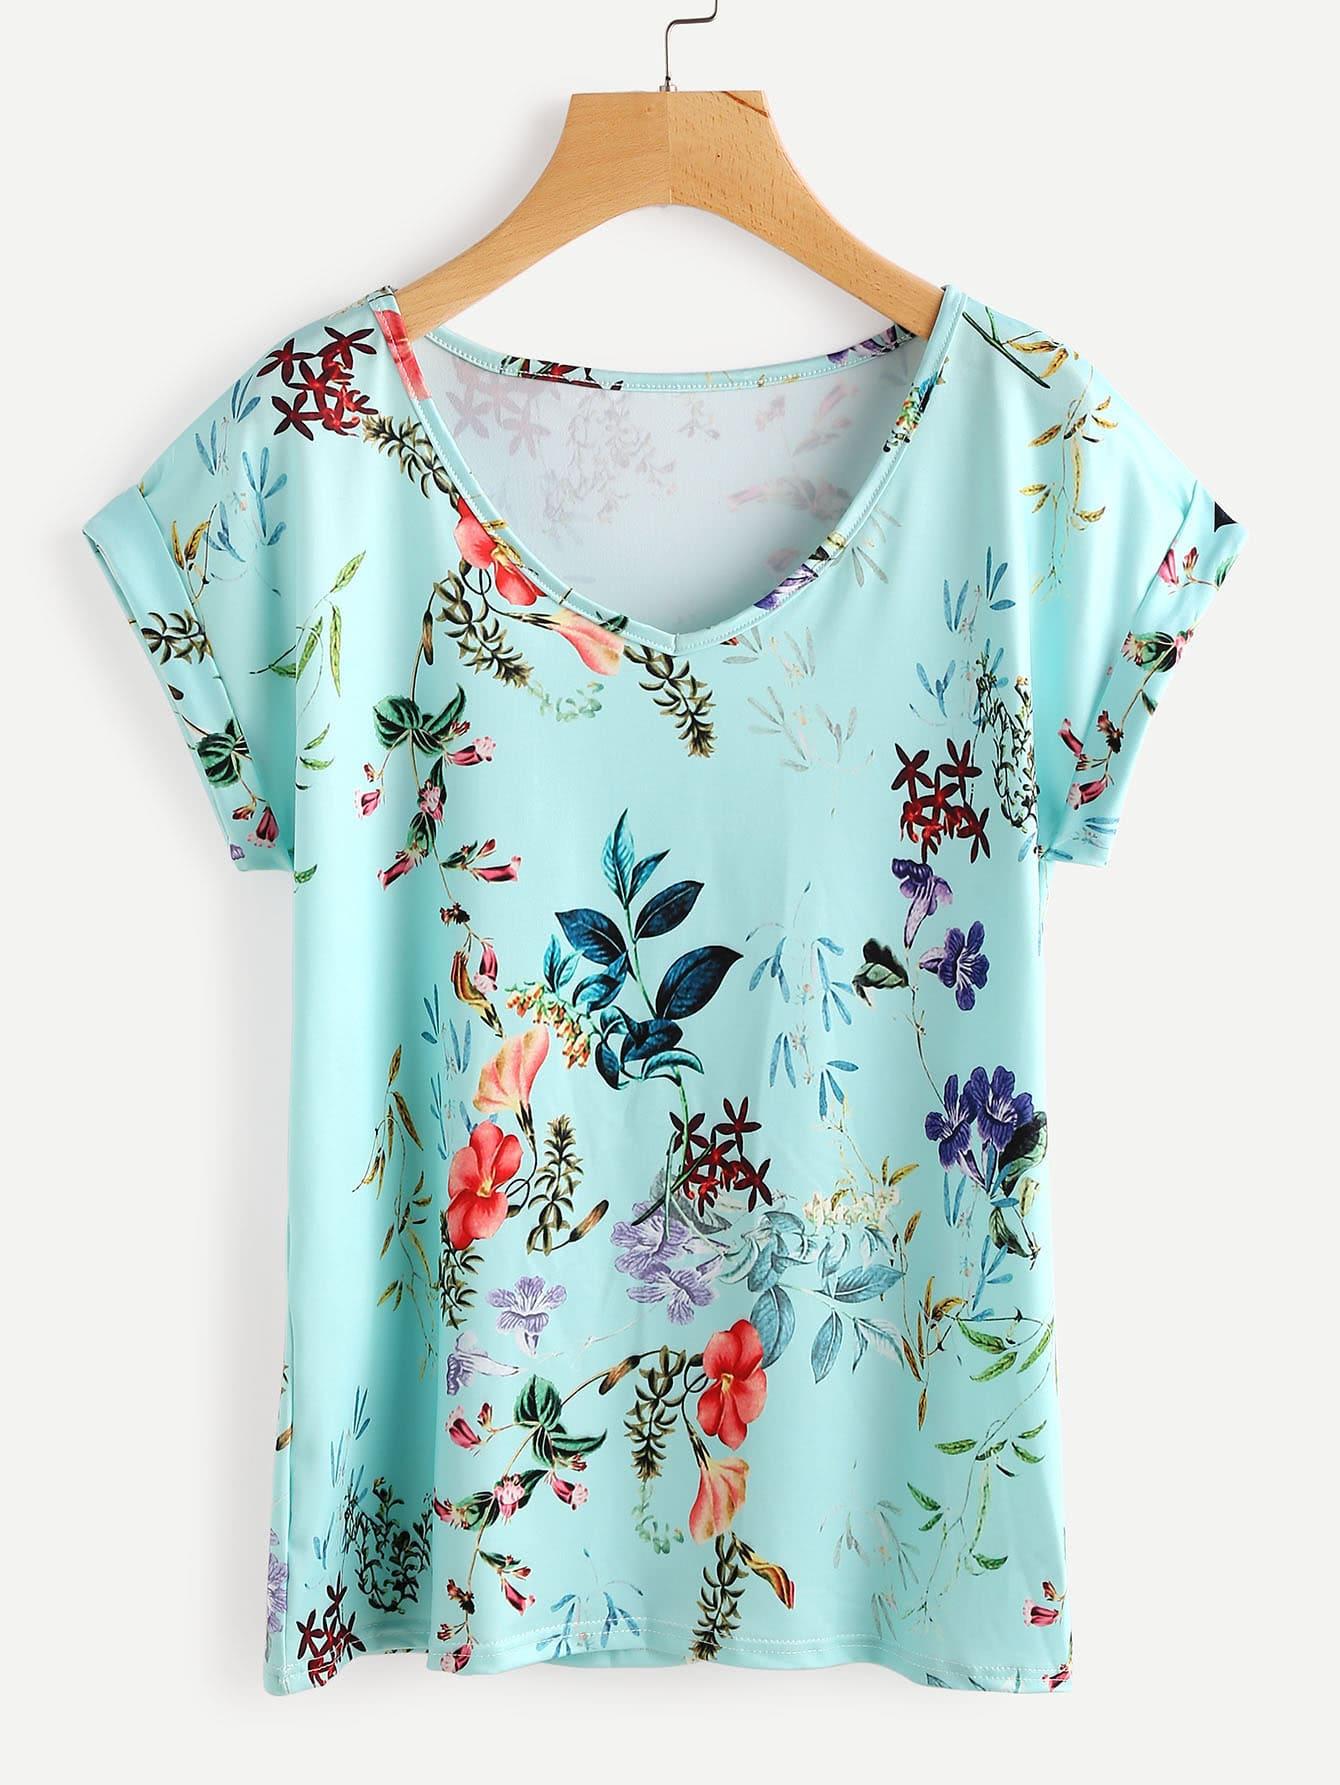 Rolled Cuff Flower Print T-shirt redfox футболка flower t 42 4300 желтый